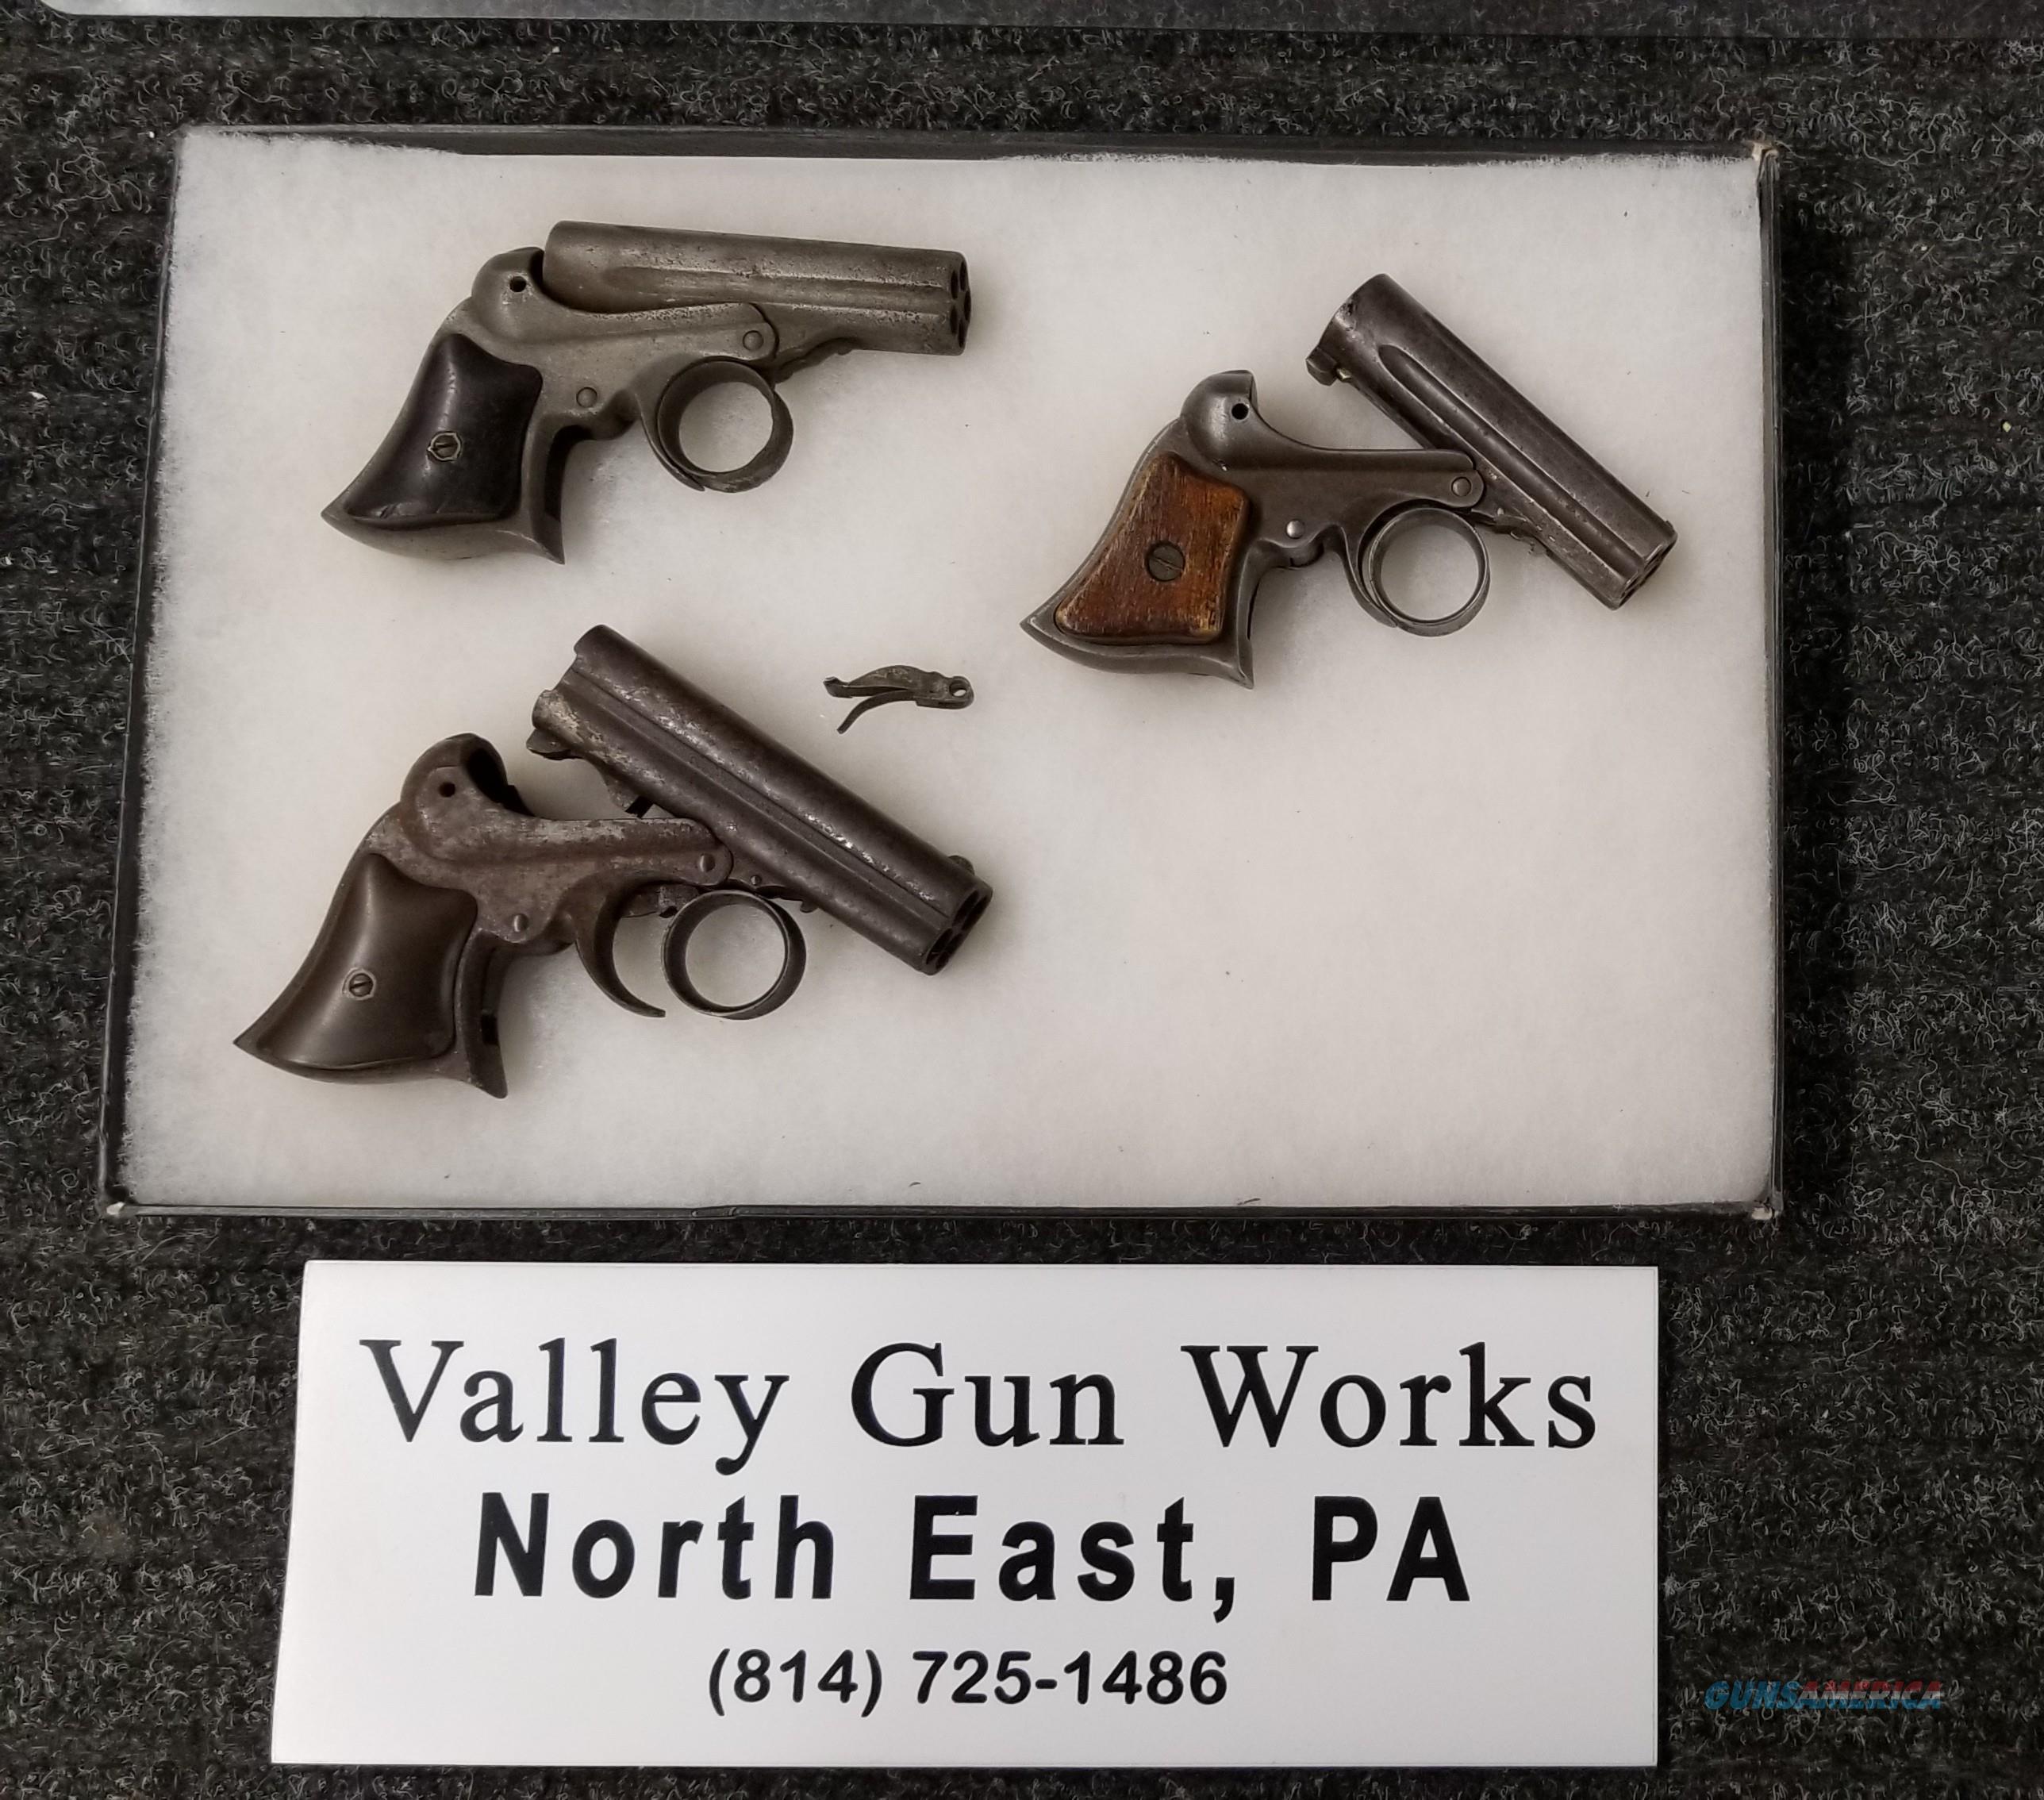 Remington Elliot Pistols - Three - 22 & 32 Rimfire - No FFL Needed -  Free Shipping  Non-Guns > Black Powder Cartridge